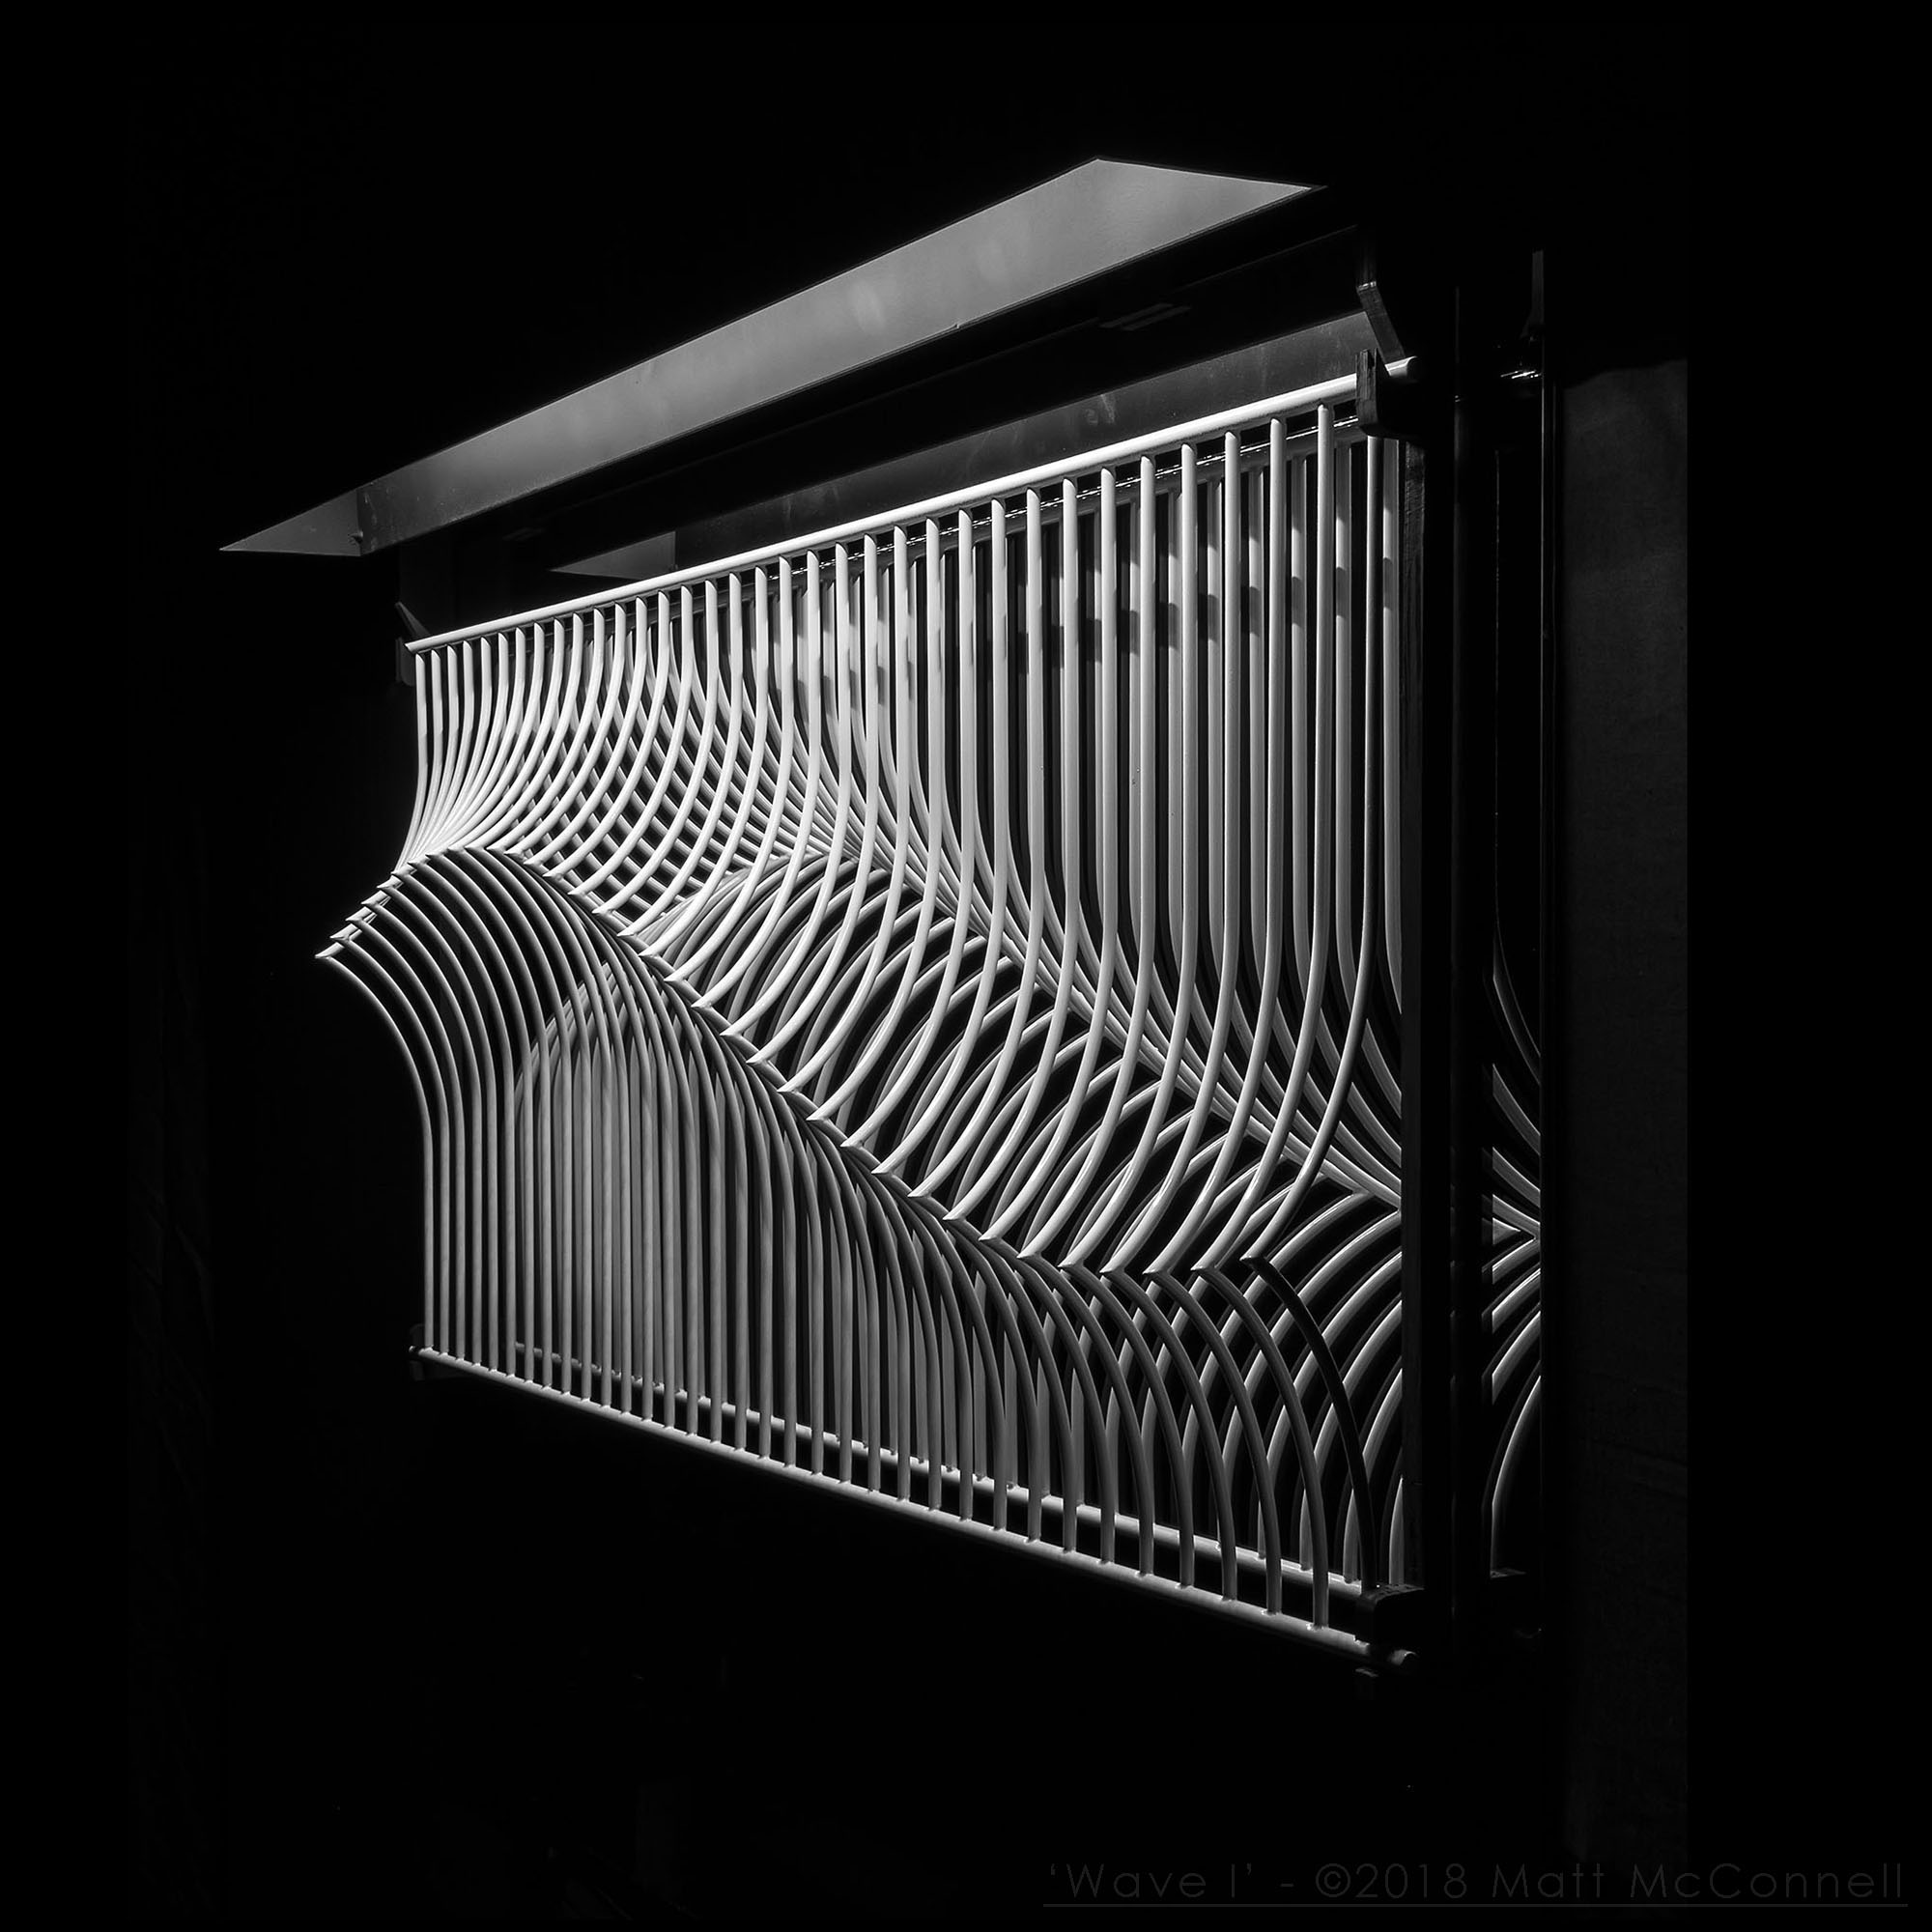 'Wave I-©2018 Matt McConnell - 01.jpg